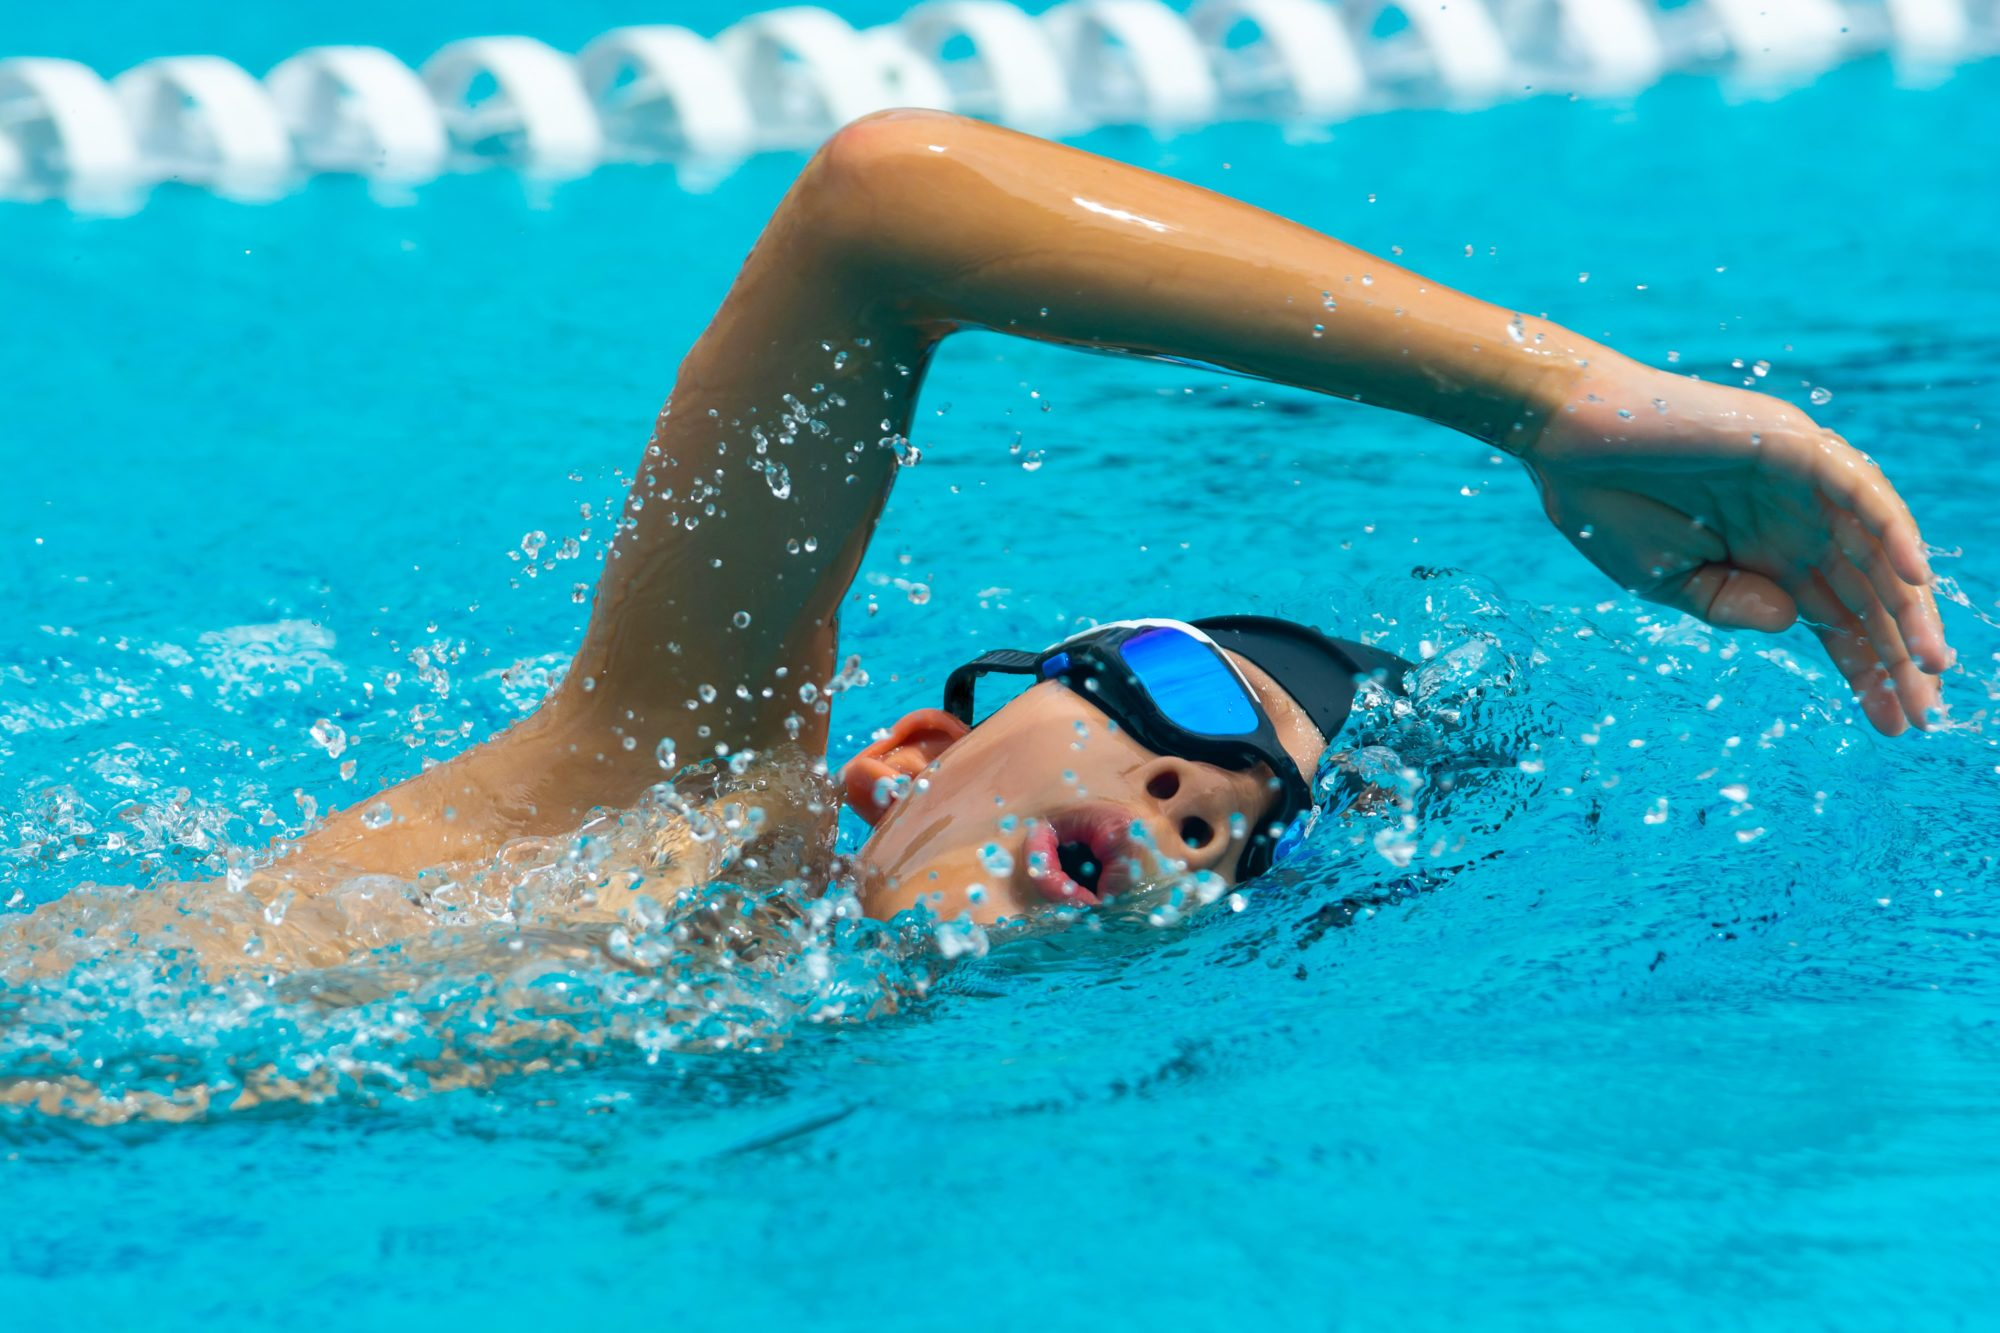 ademspier training trainingsbegeleiding bij sport medisch centrum papendal